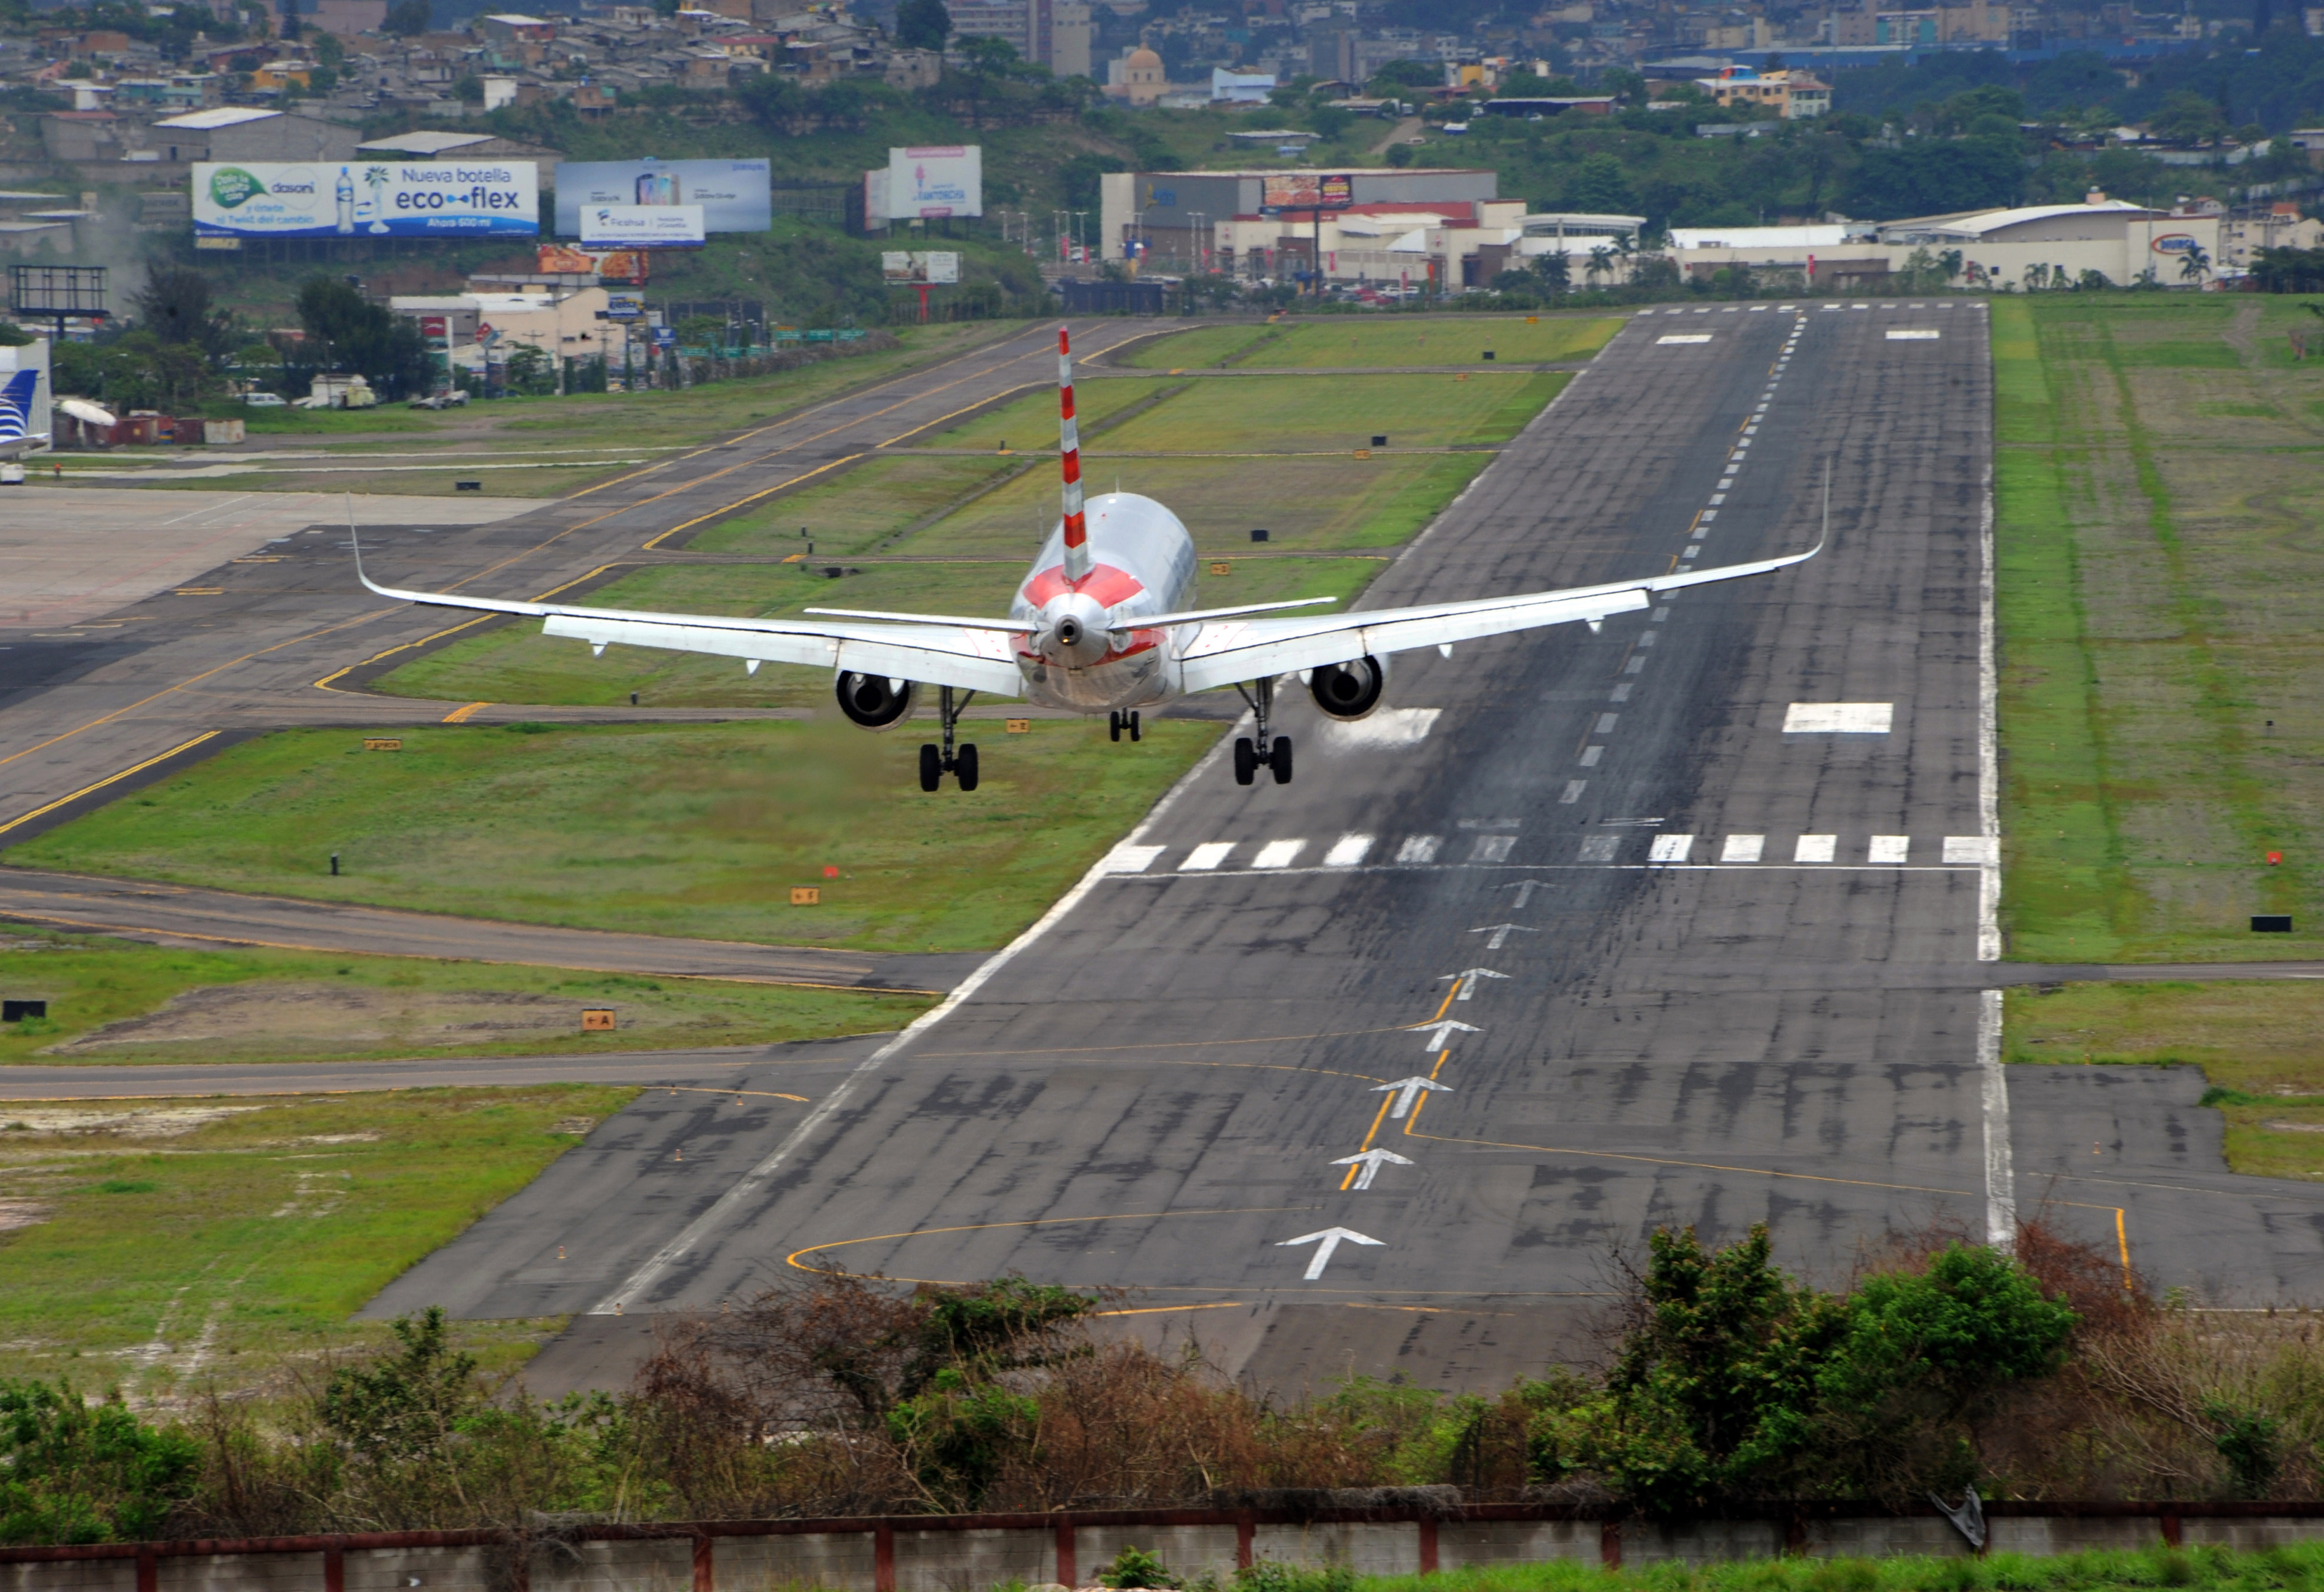 The airport in Honduras